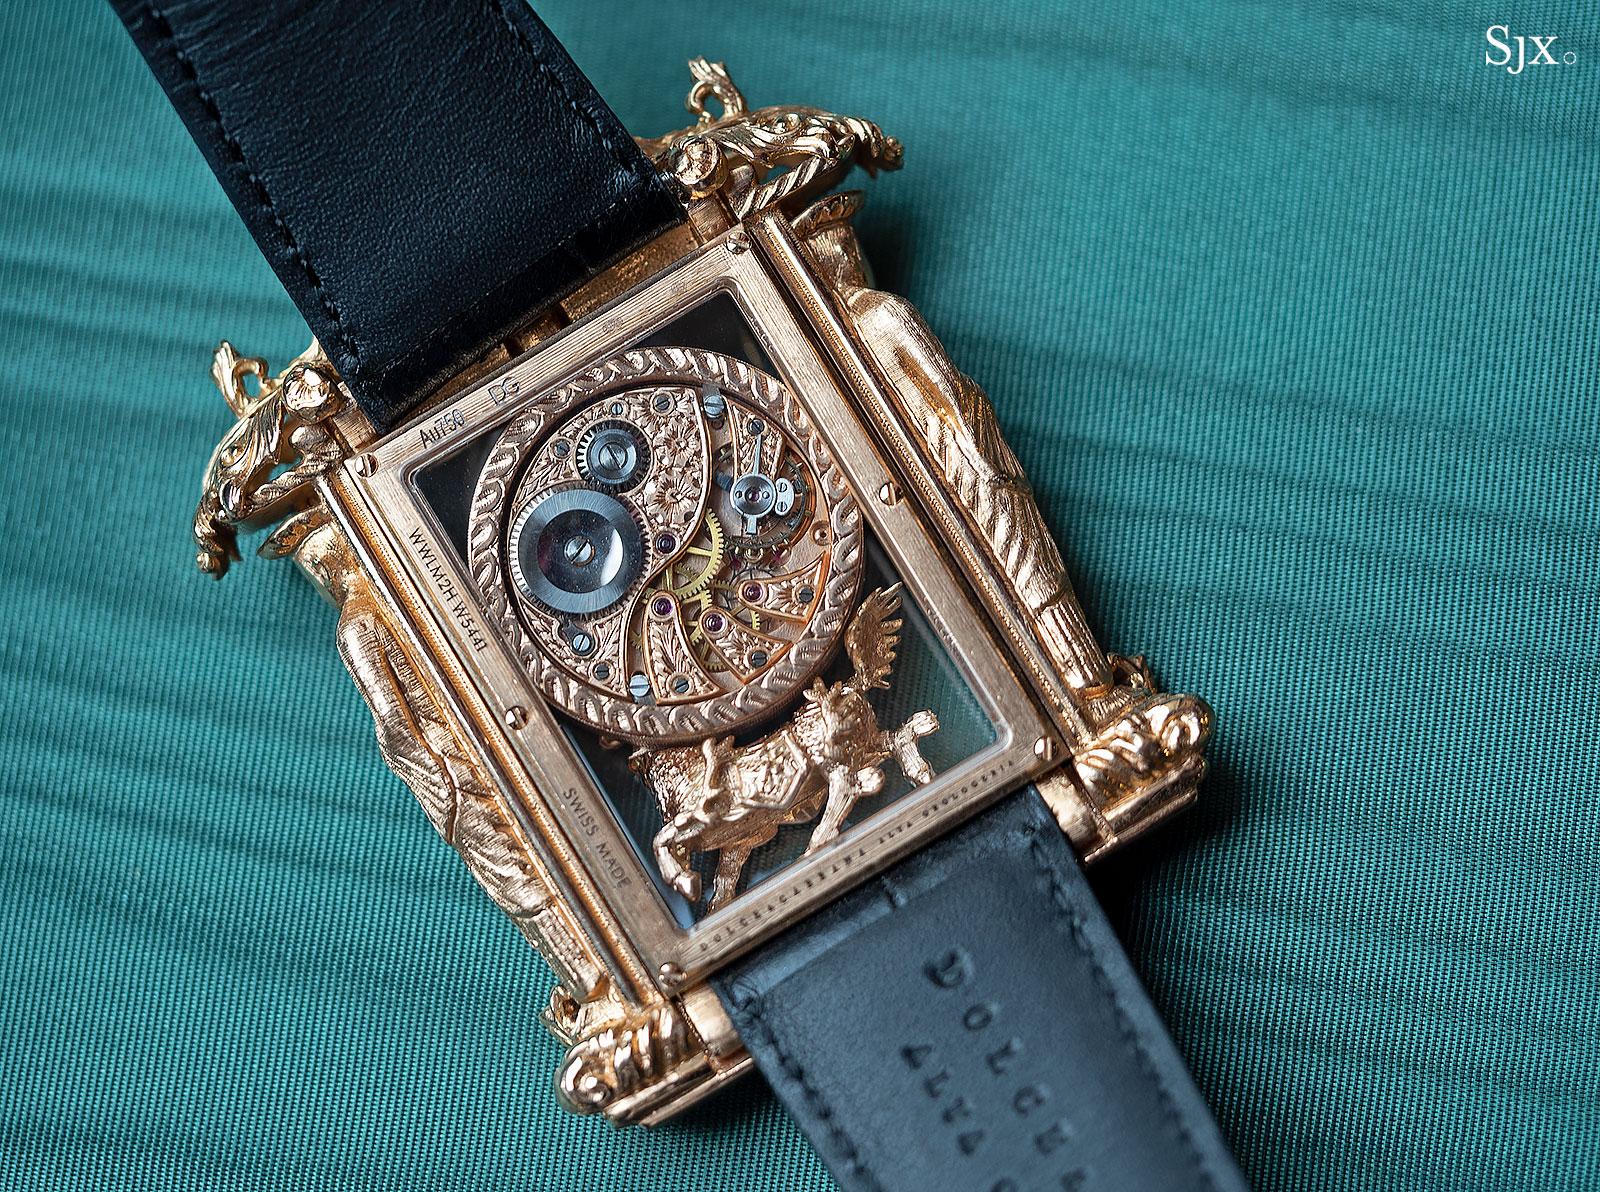 Dolce Gabbana Alta Orologeria Qilin watch 6